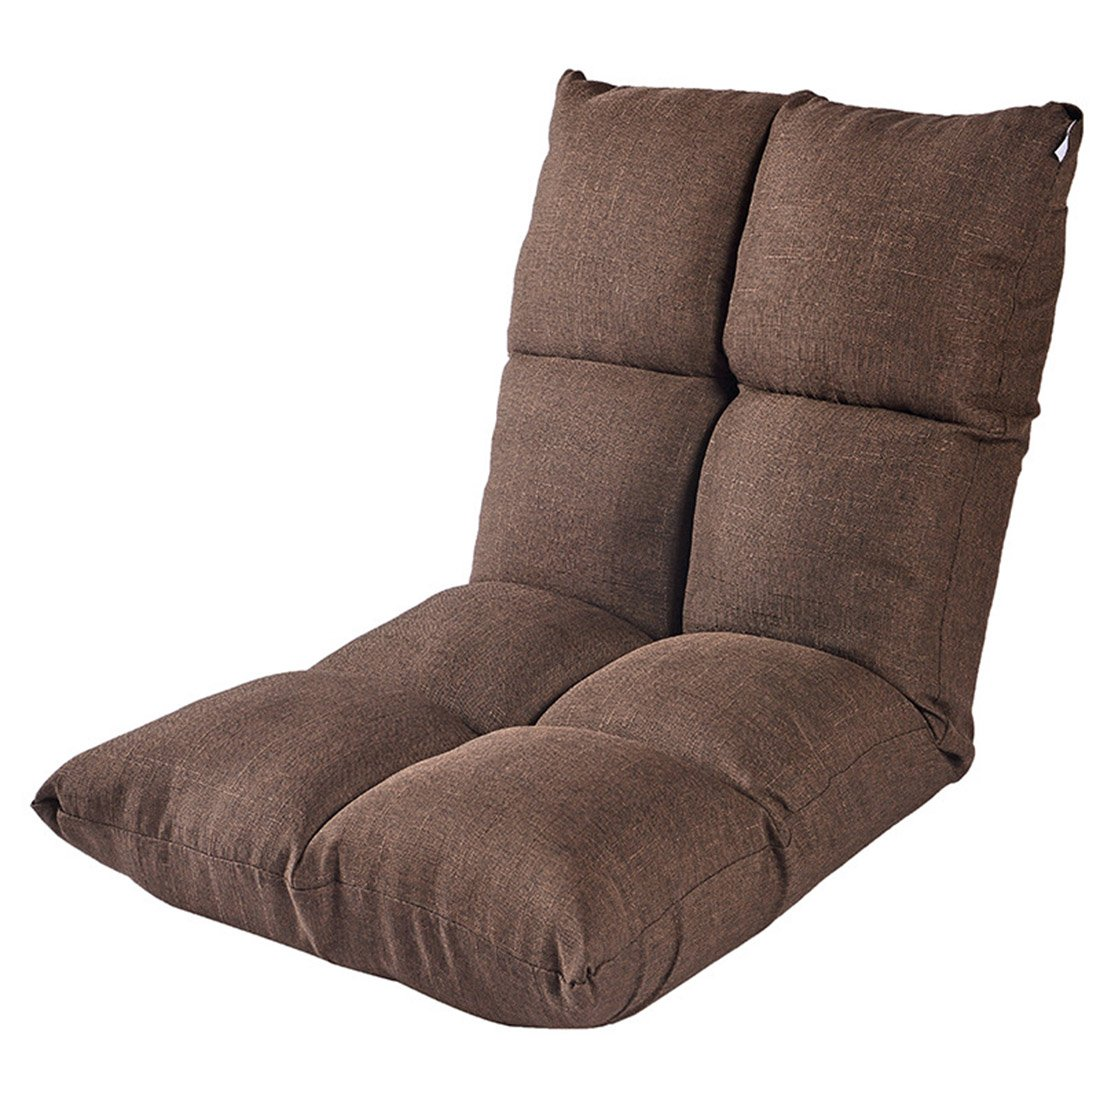 Jiyaru Adjustable Floor Chair Home Gaming Cushion Seat Folding Lazy Sofa Coffee